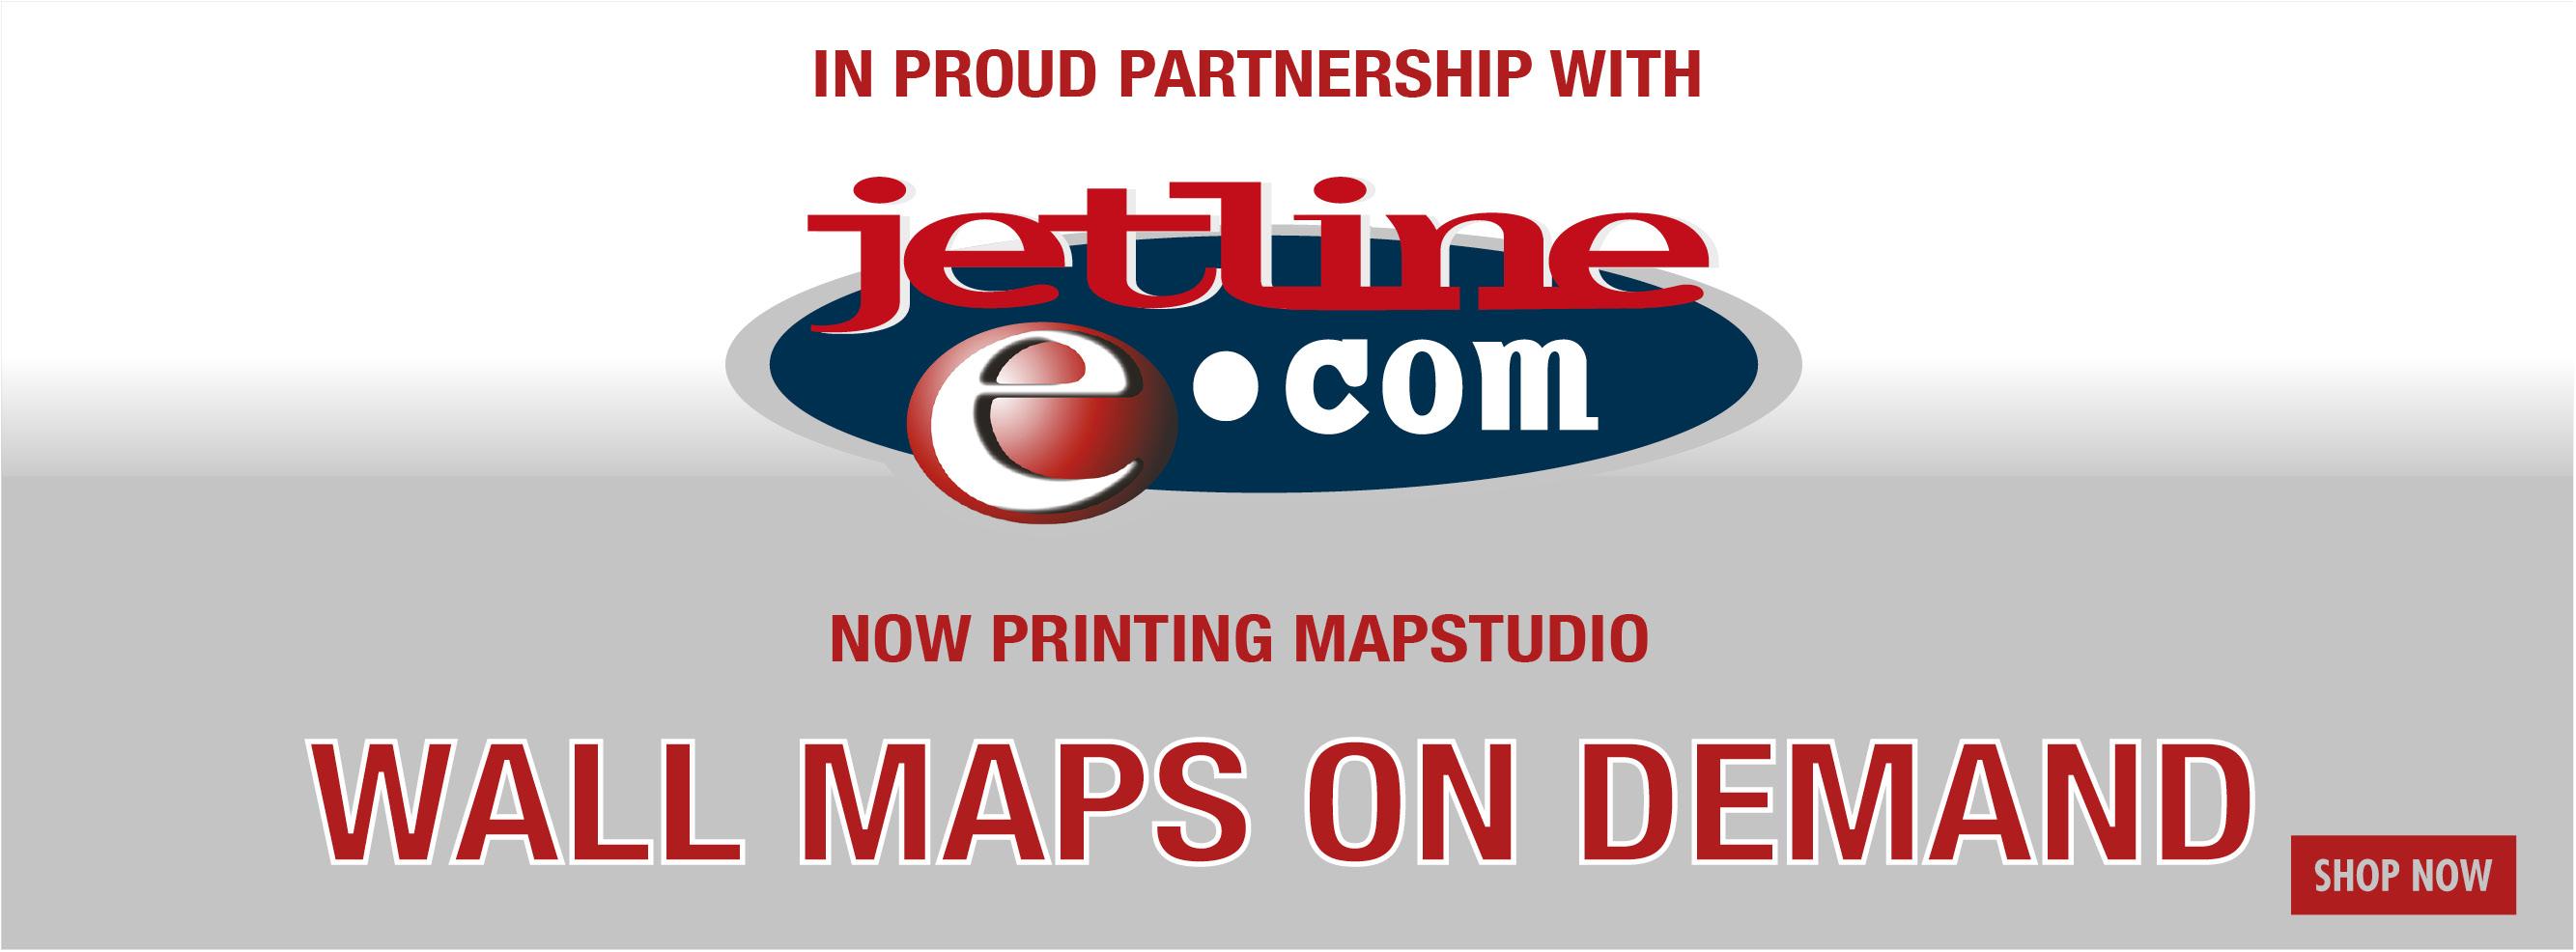 Jetline Mapstudio wall maps on demand